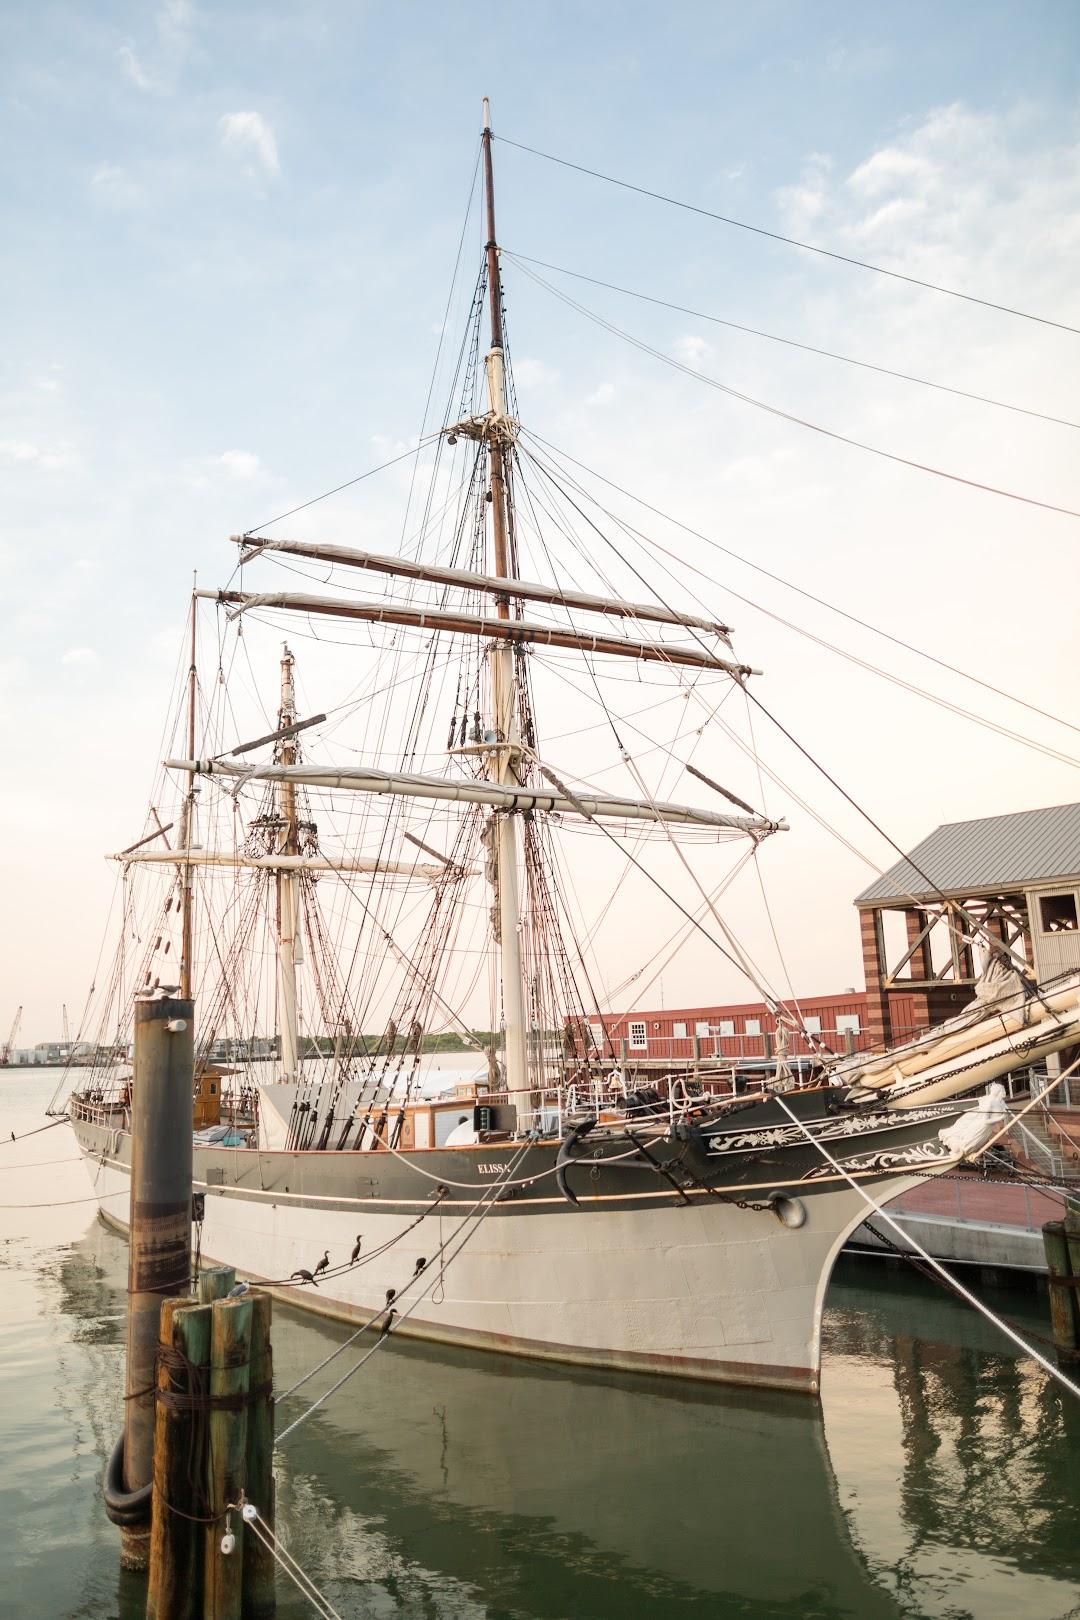 Galveston Historic Seaport - Home of the 1877 Tall Ship ELISSA